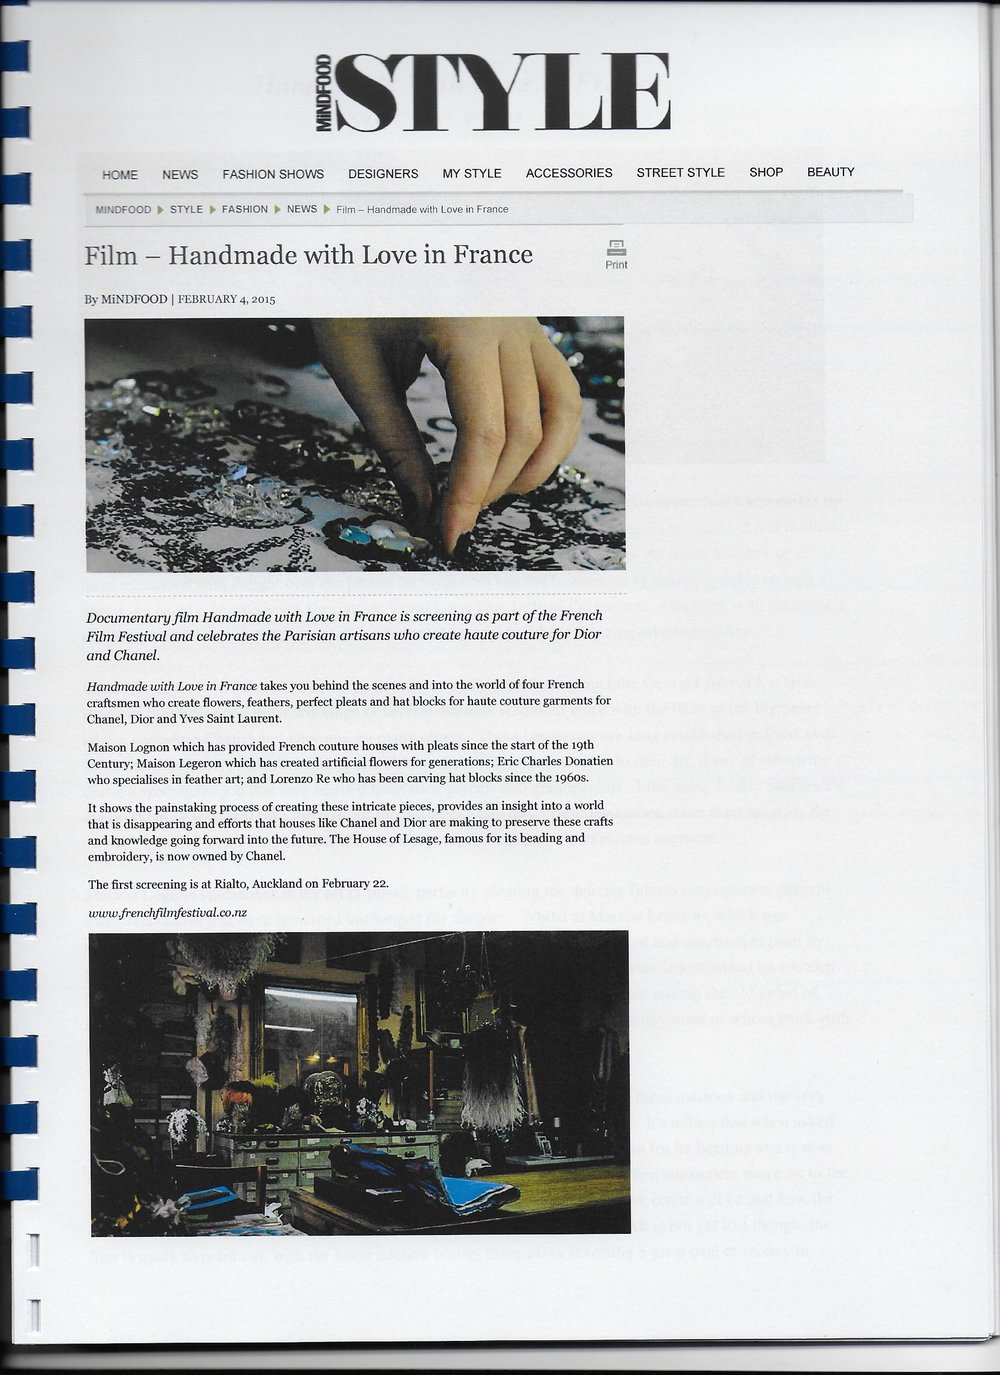 PRESS HAND MADE WITH LOVE 1.jpg